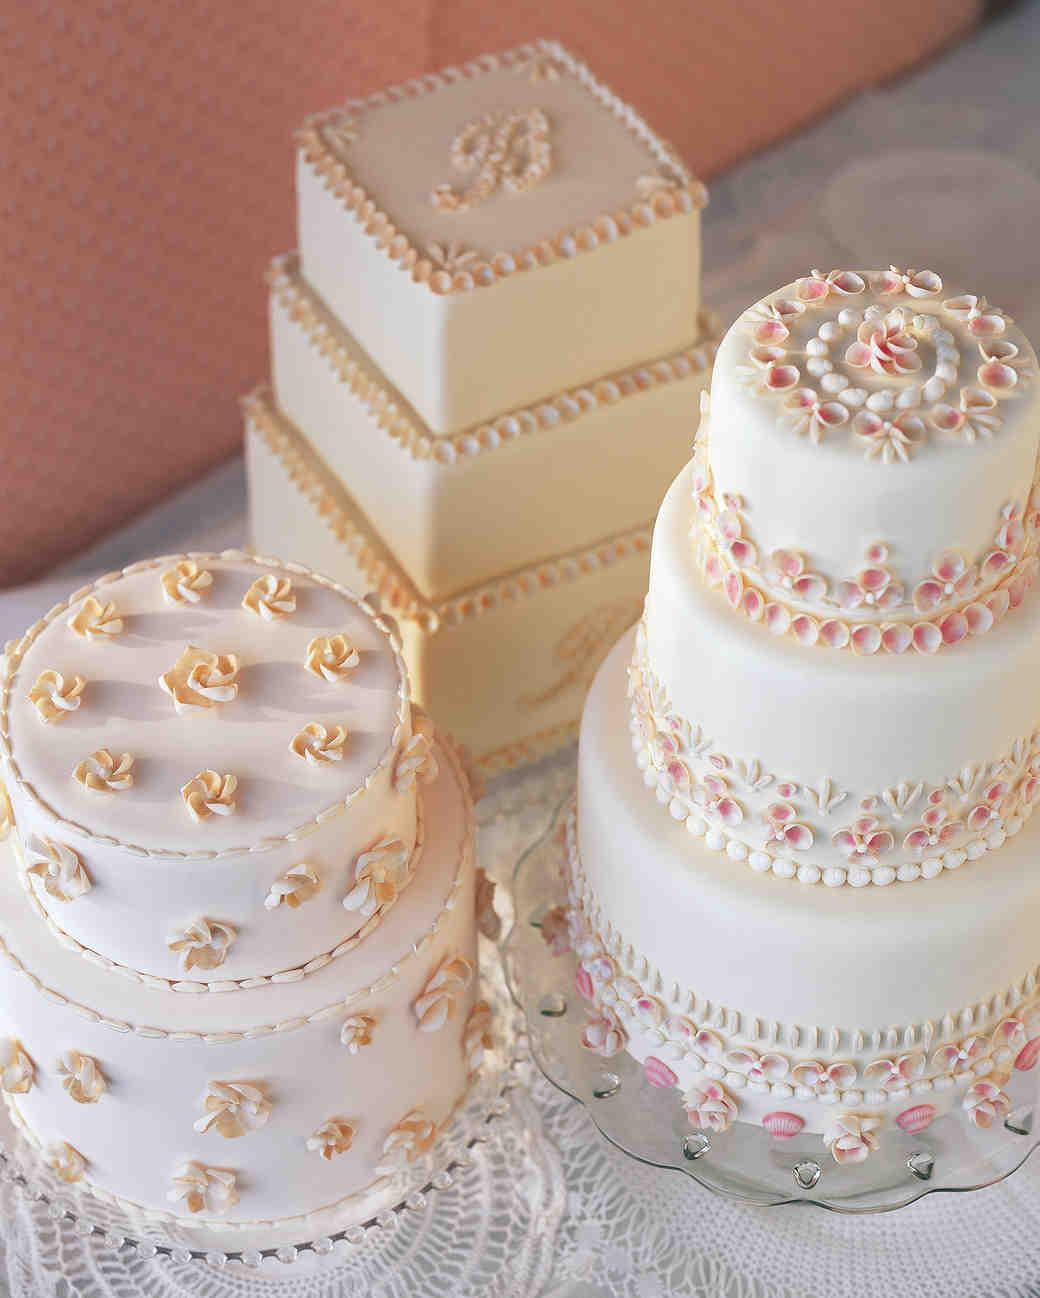 beach-wedding-cakes-mwa102213-shelldetail-0615.jpg